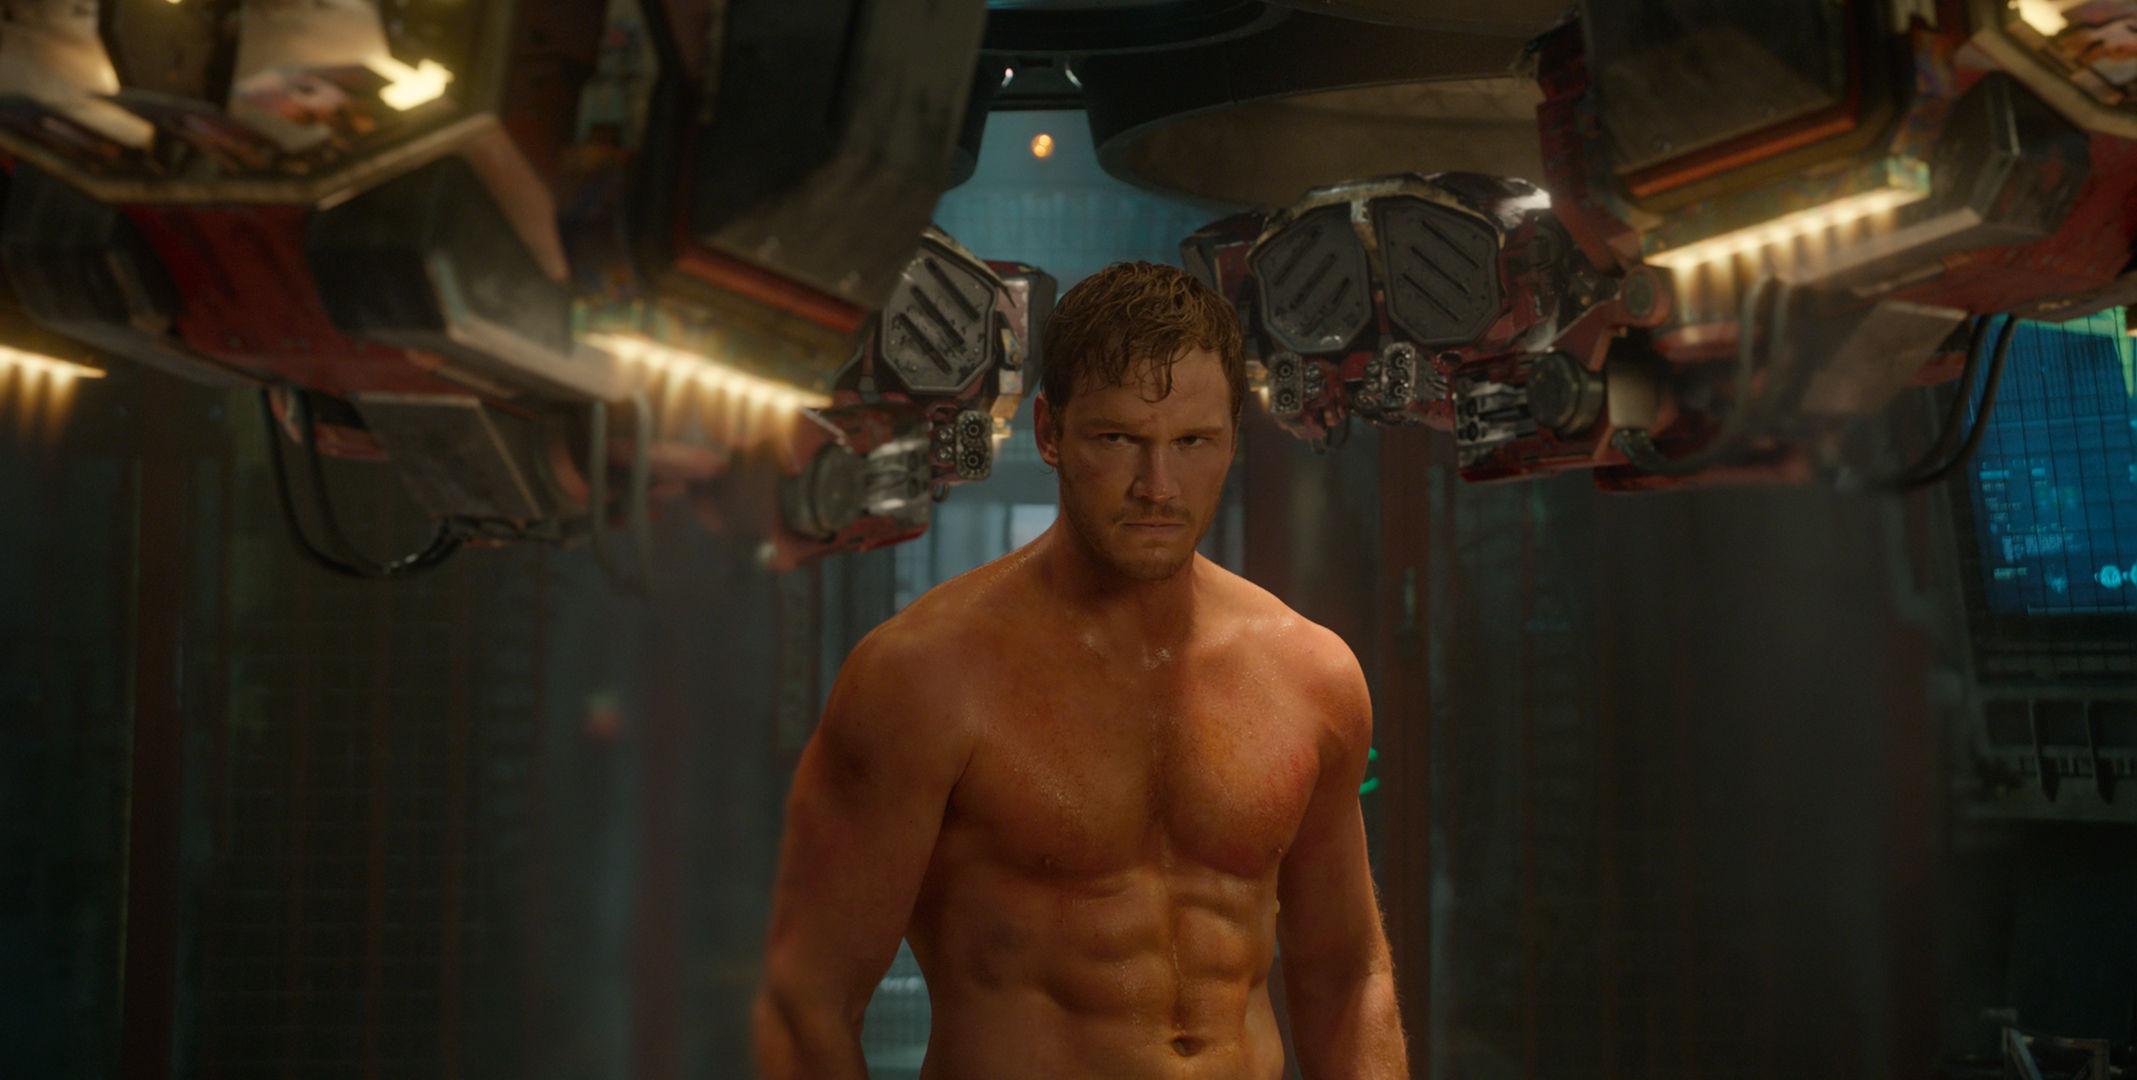 Guardians-of-the-Galaxy-Official-Photo-Chris-Pratt-Workout